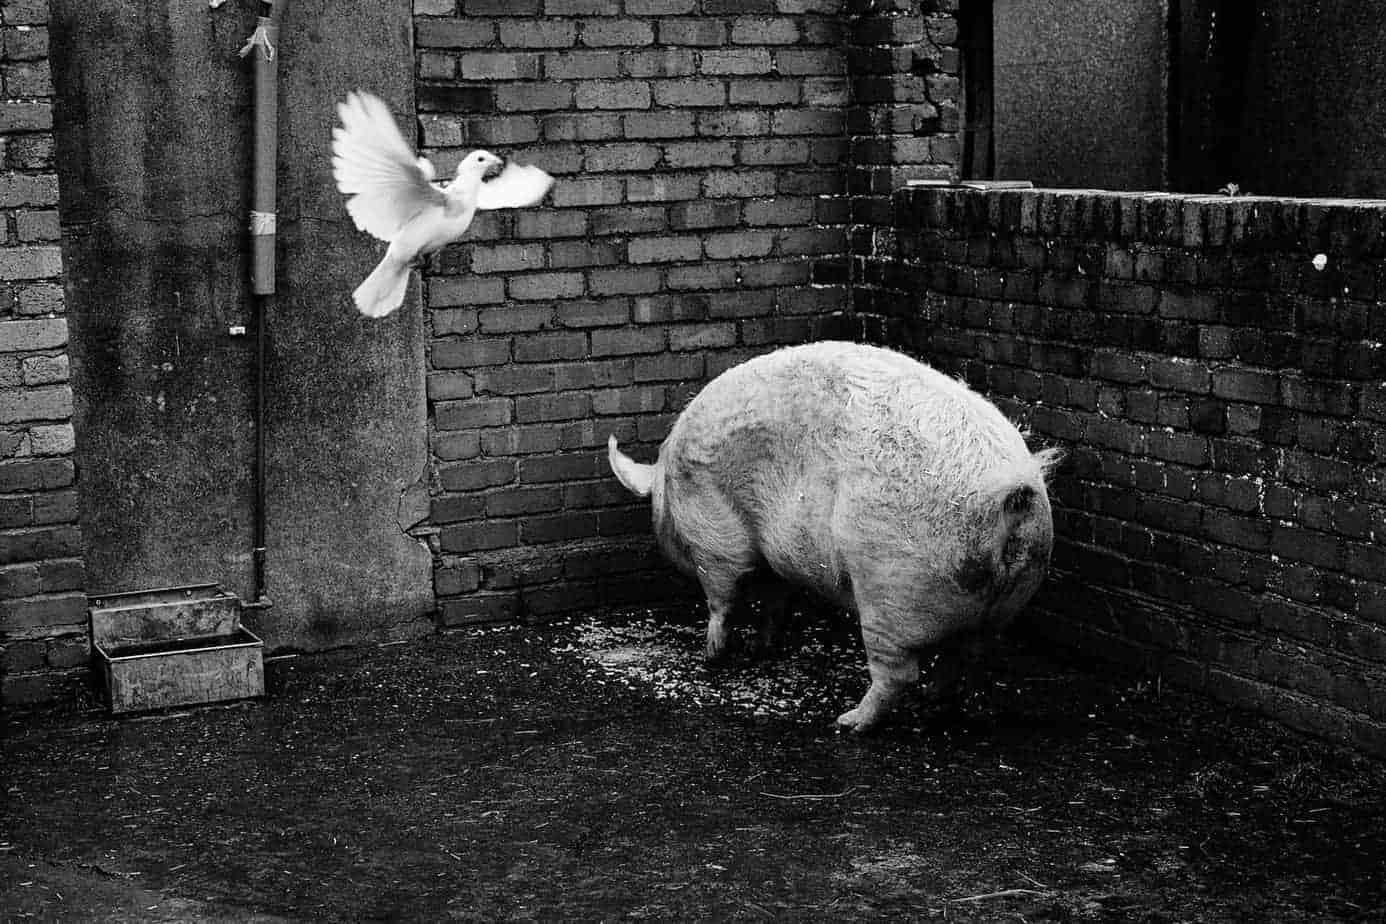 Pig & Dove